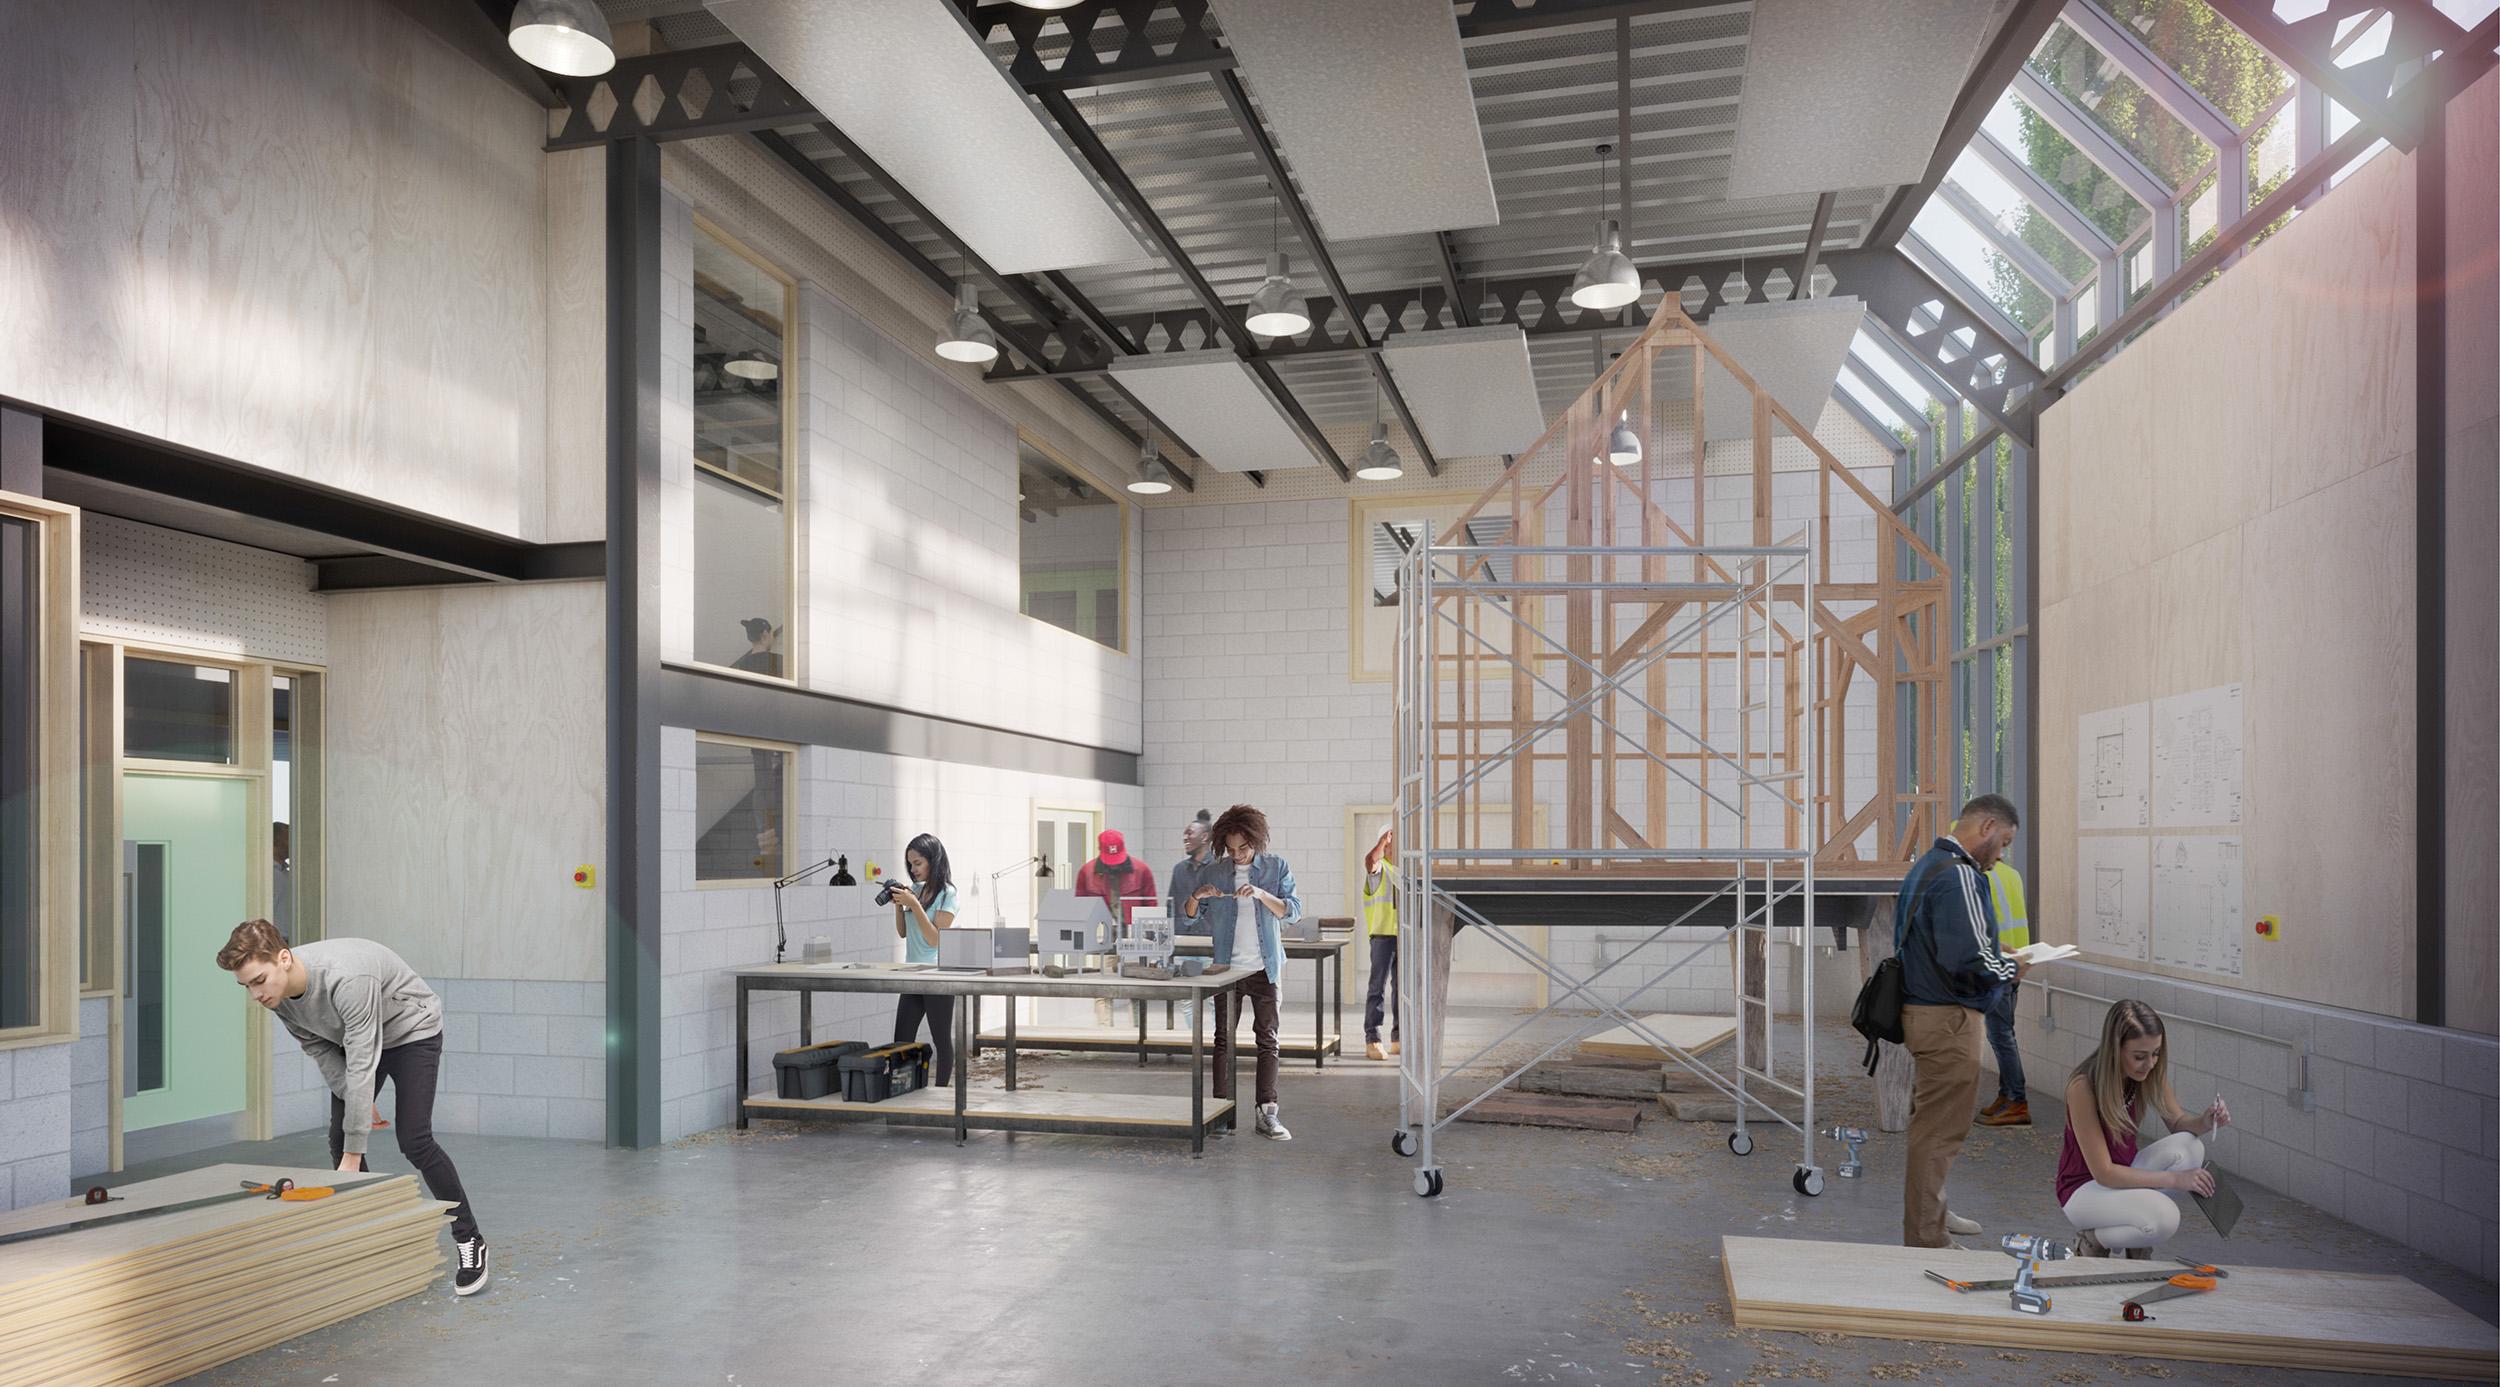 £30m Kingston School of Art campus refurbishment focuses on sustainability